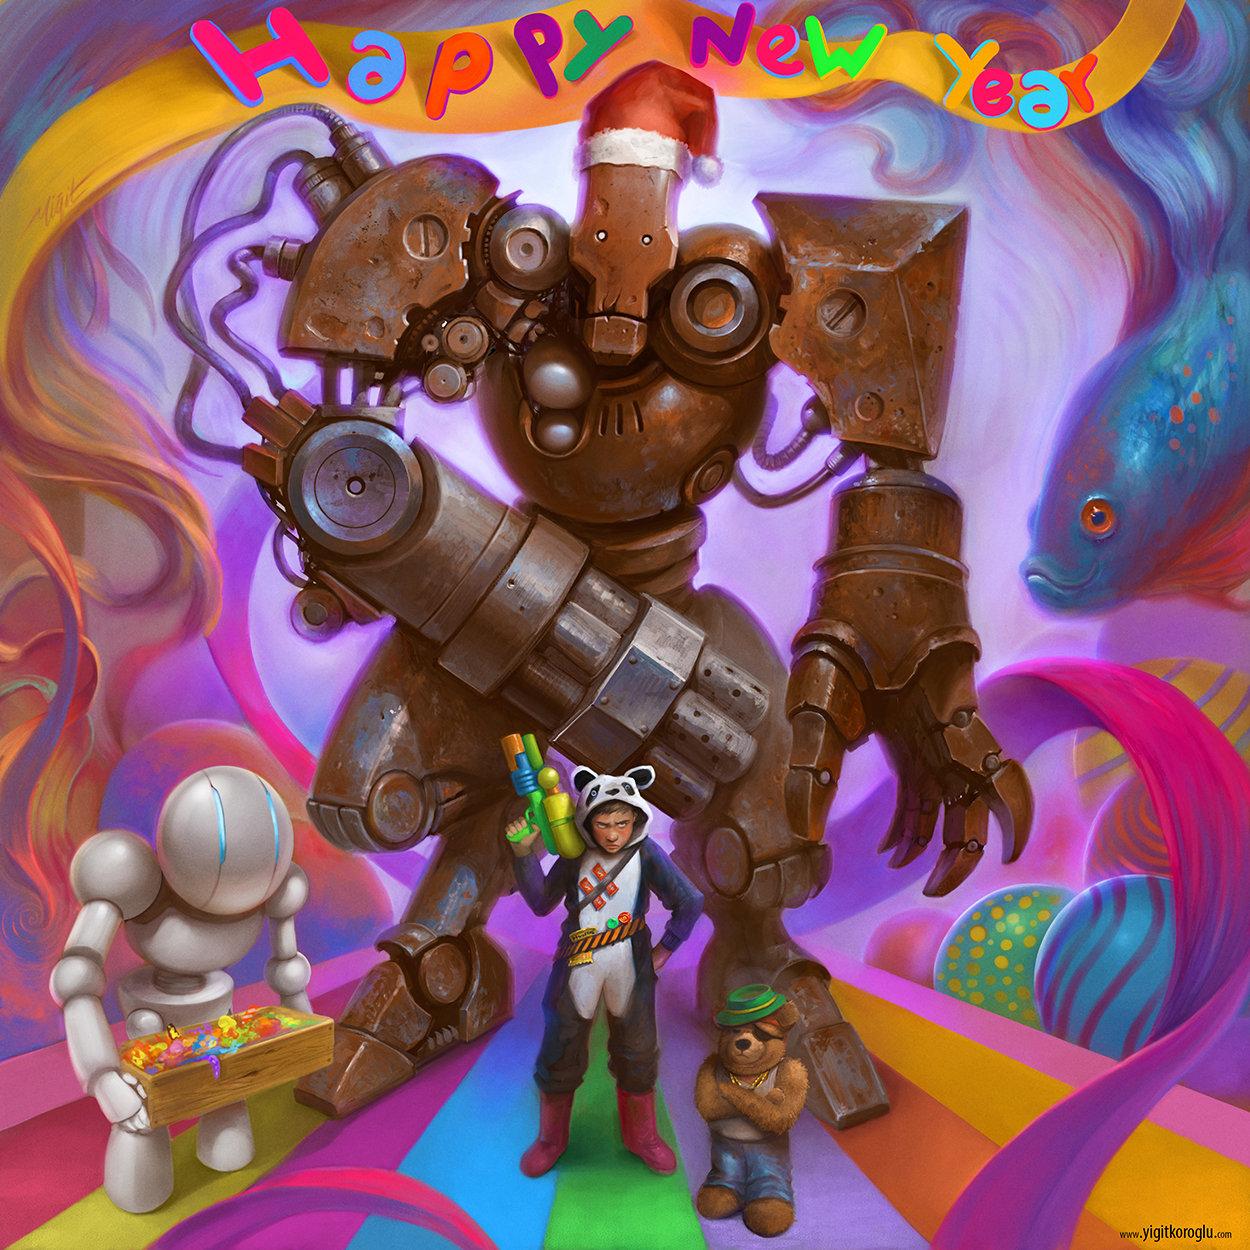 Yigit koroglu happy 2015fb